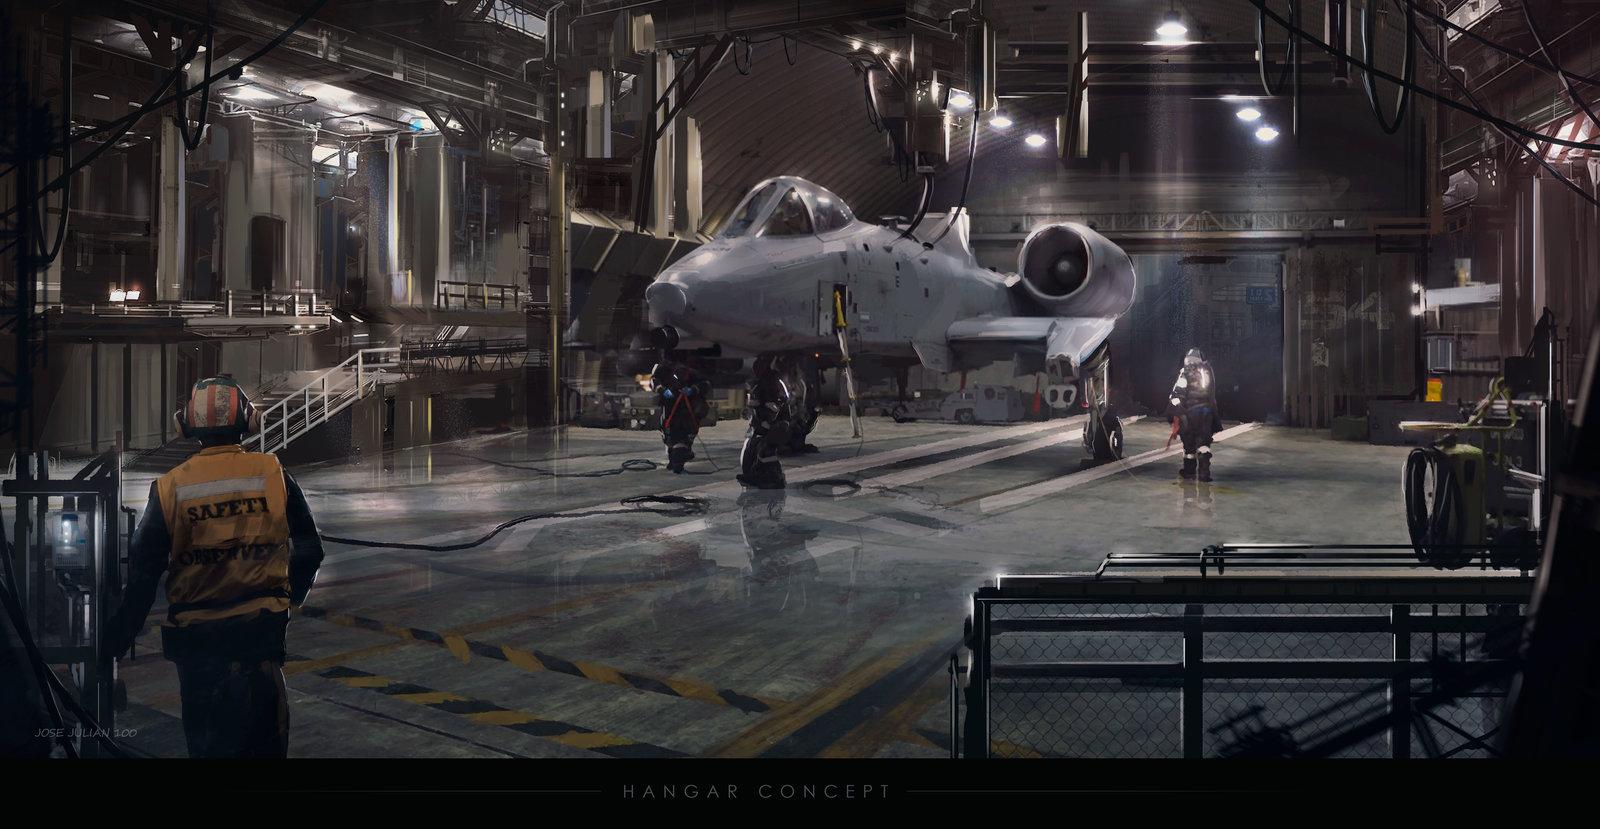 Hangar concept.